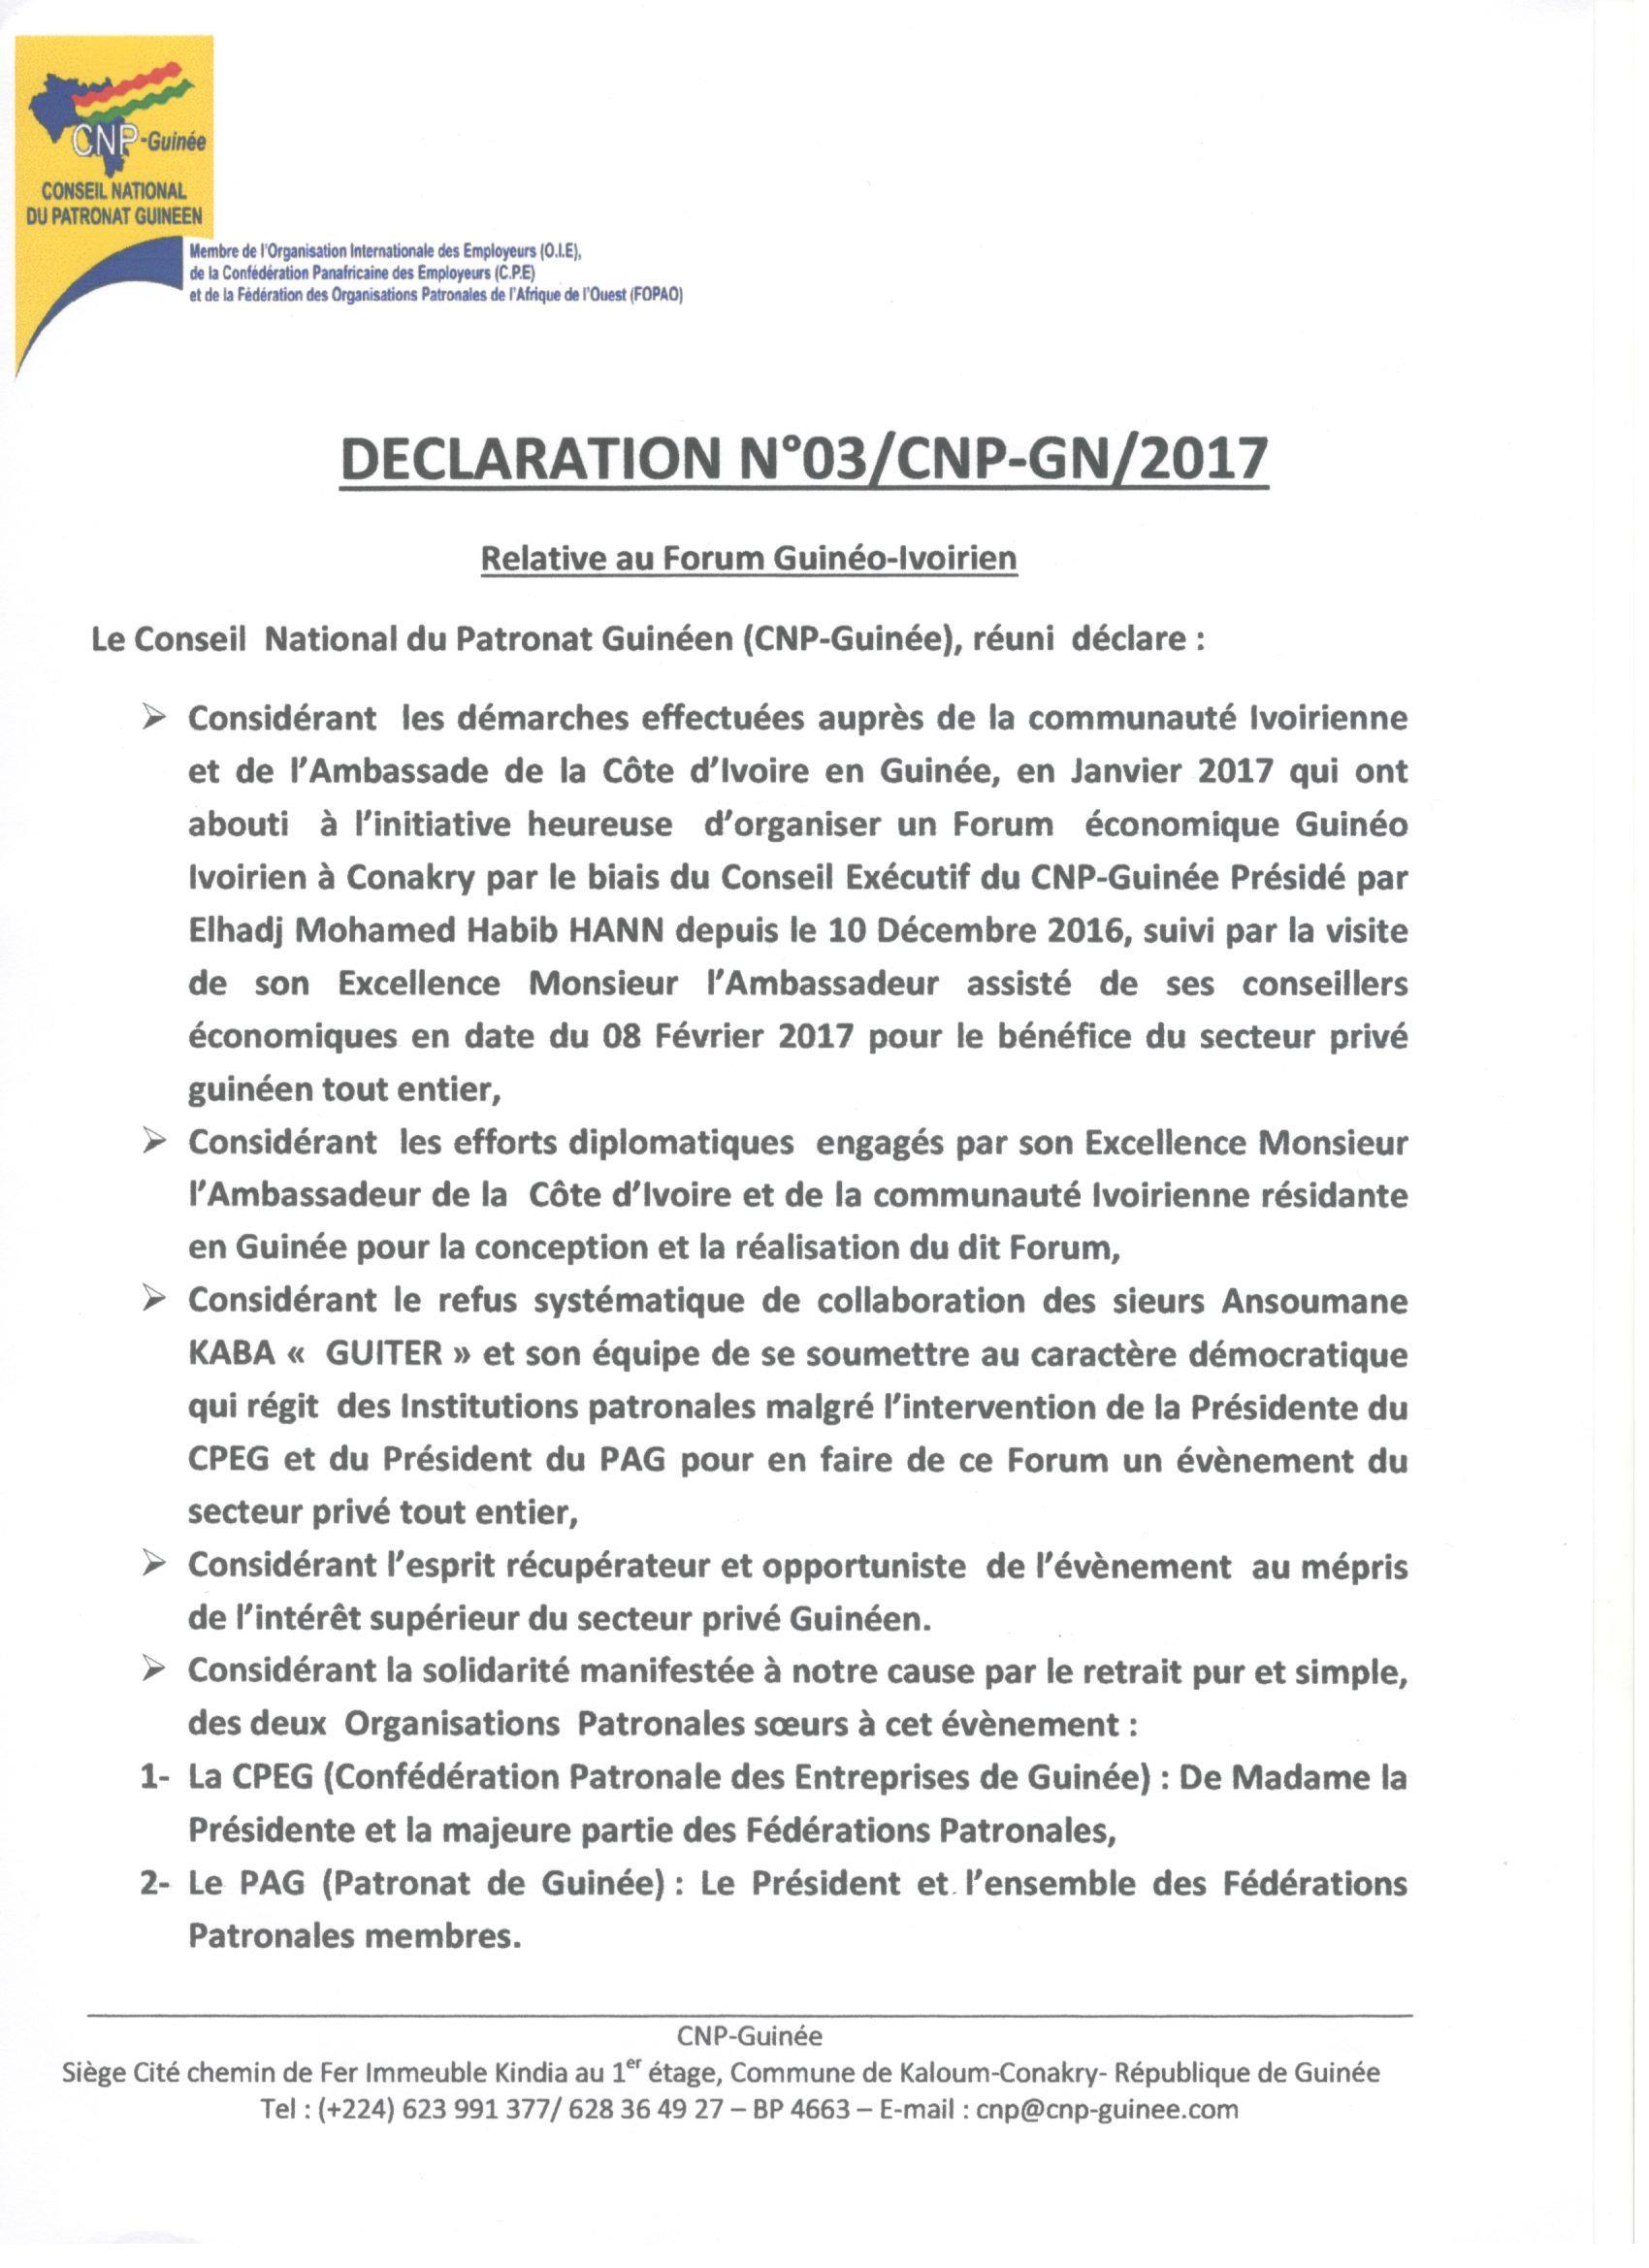 https://i2.wp.com/www.bcmedia.org/wp-content/uploads/2017/07/declaration-N%C2%B03-format-JPEG0001.jpg